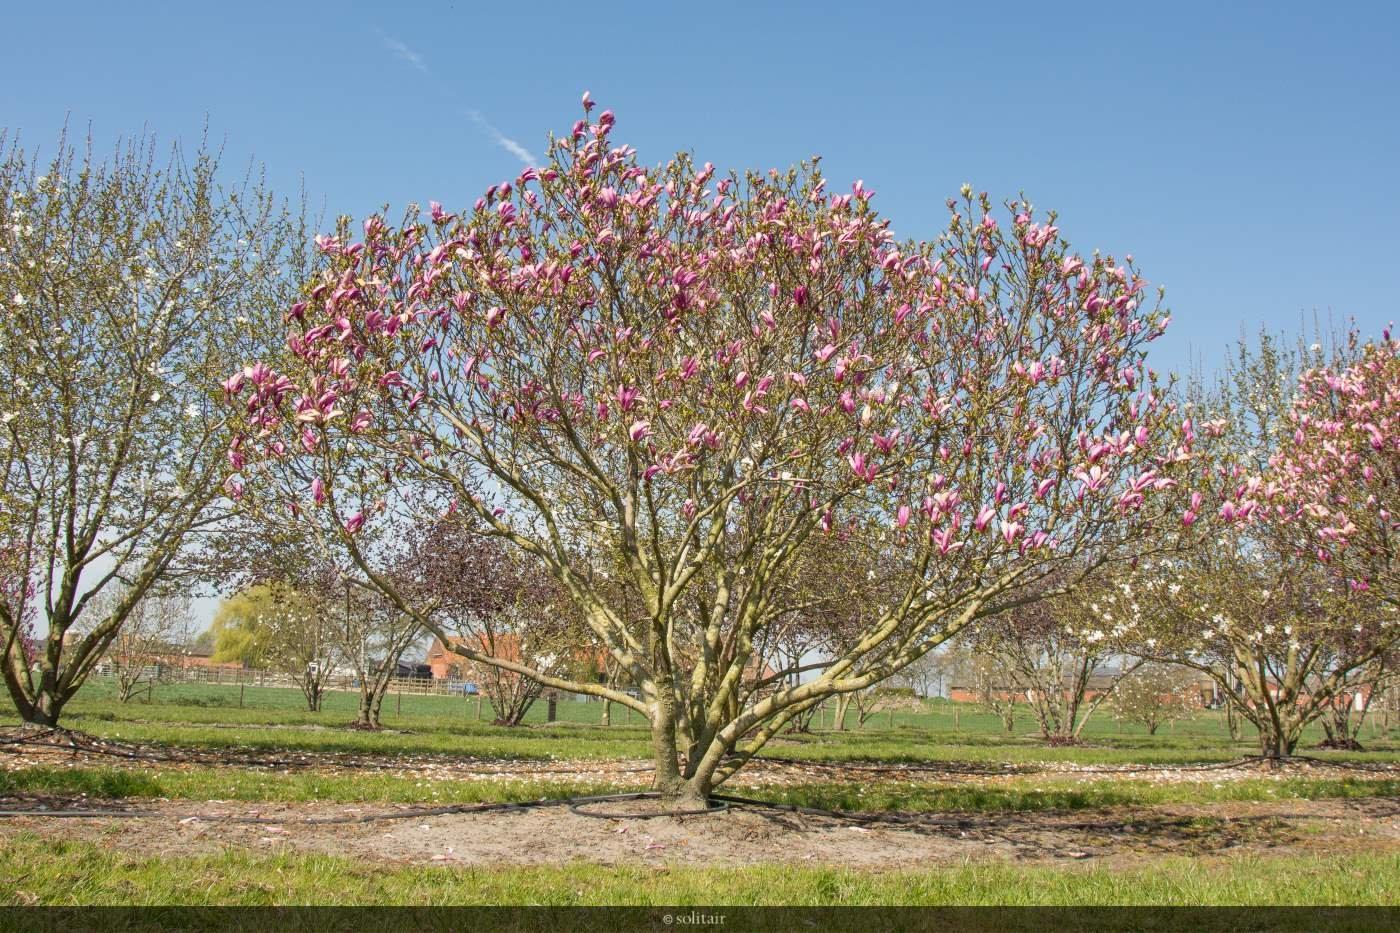 Magnolia 'Susan' multistemmed bush